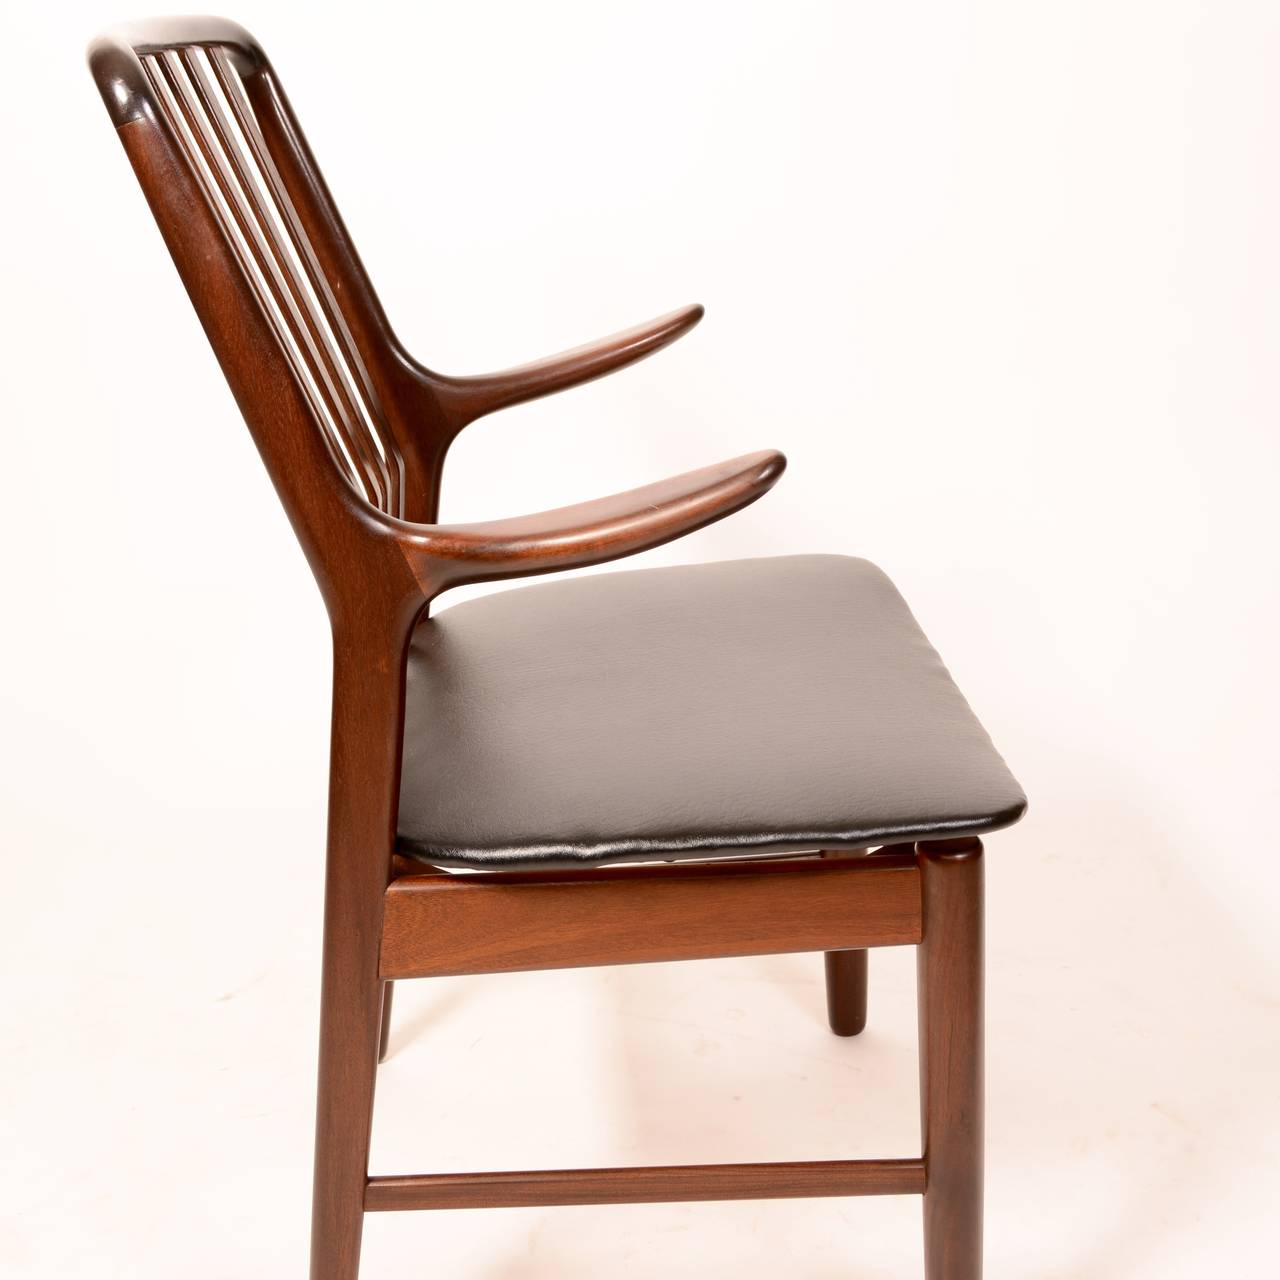 Danish Arm Chairs by Svend A Madsen for Moreddi Set of 2  : DSC3967l from www.1stdibs.com size 1280 x 1280 jpeg 82kB